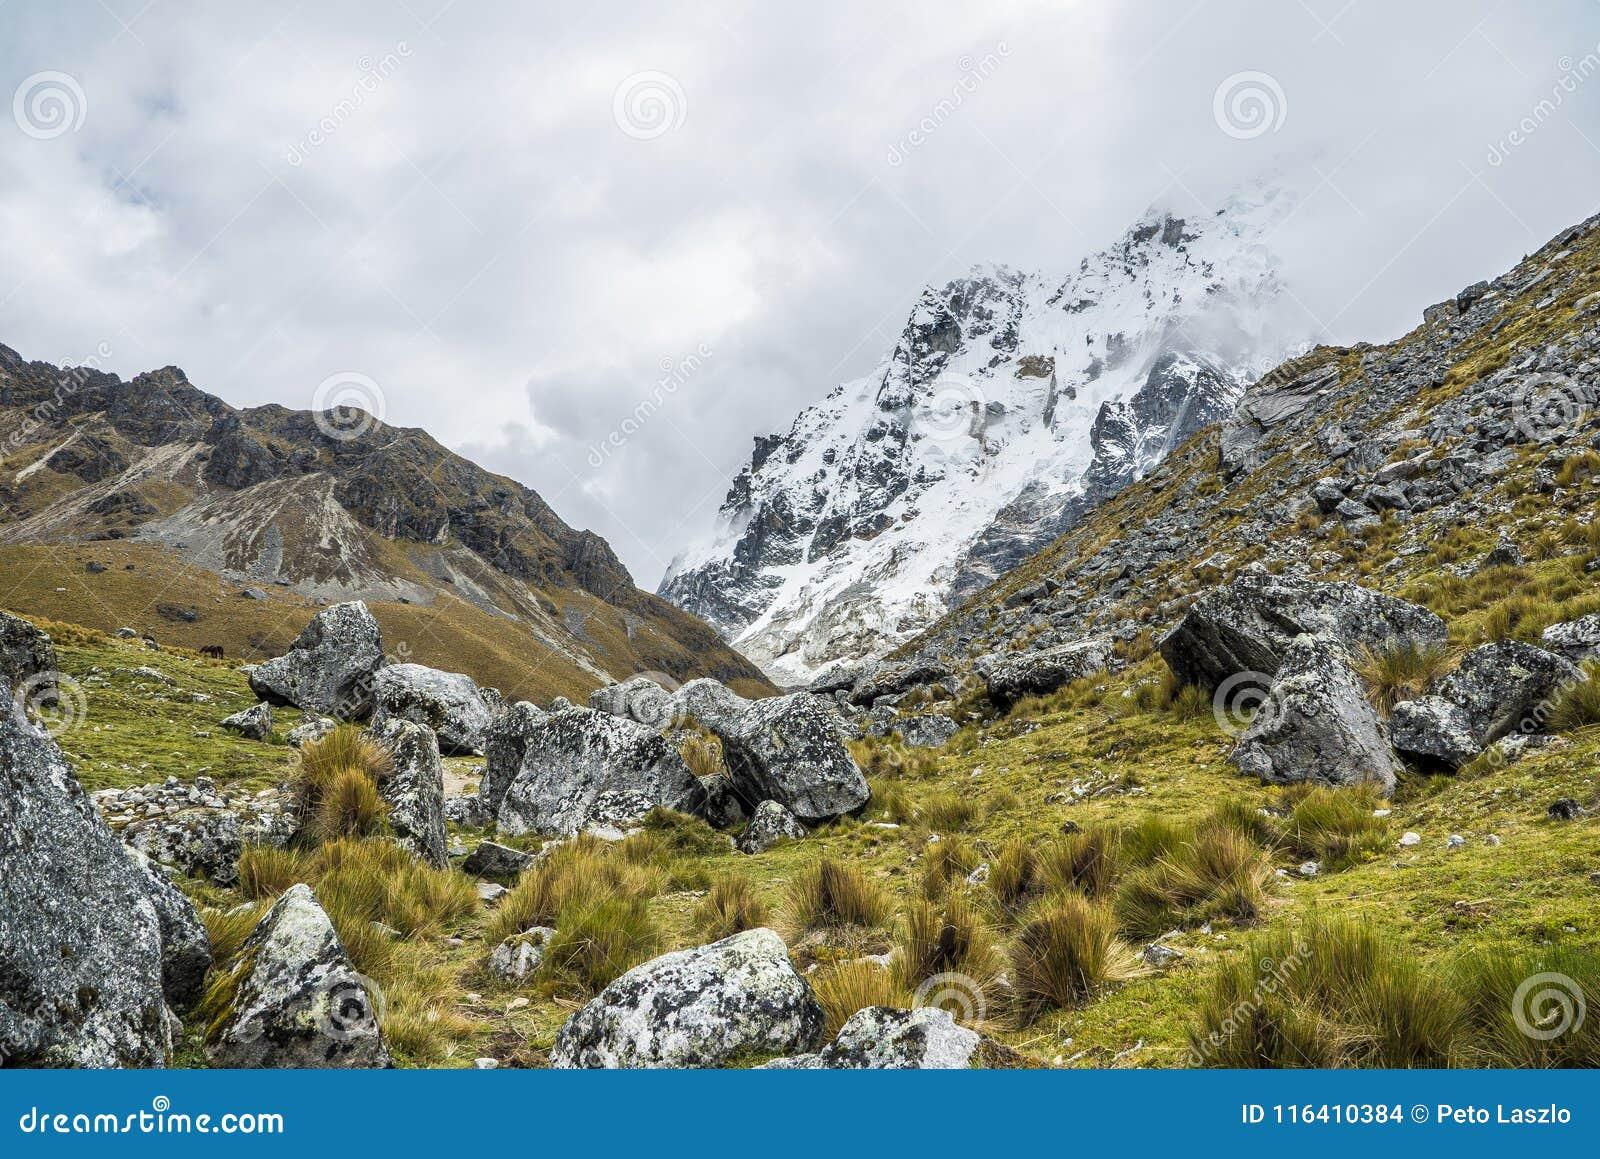 Peru Trekking de Salkantay